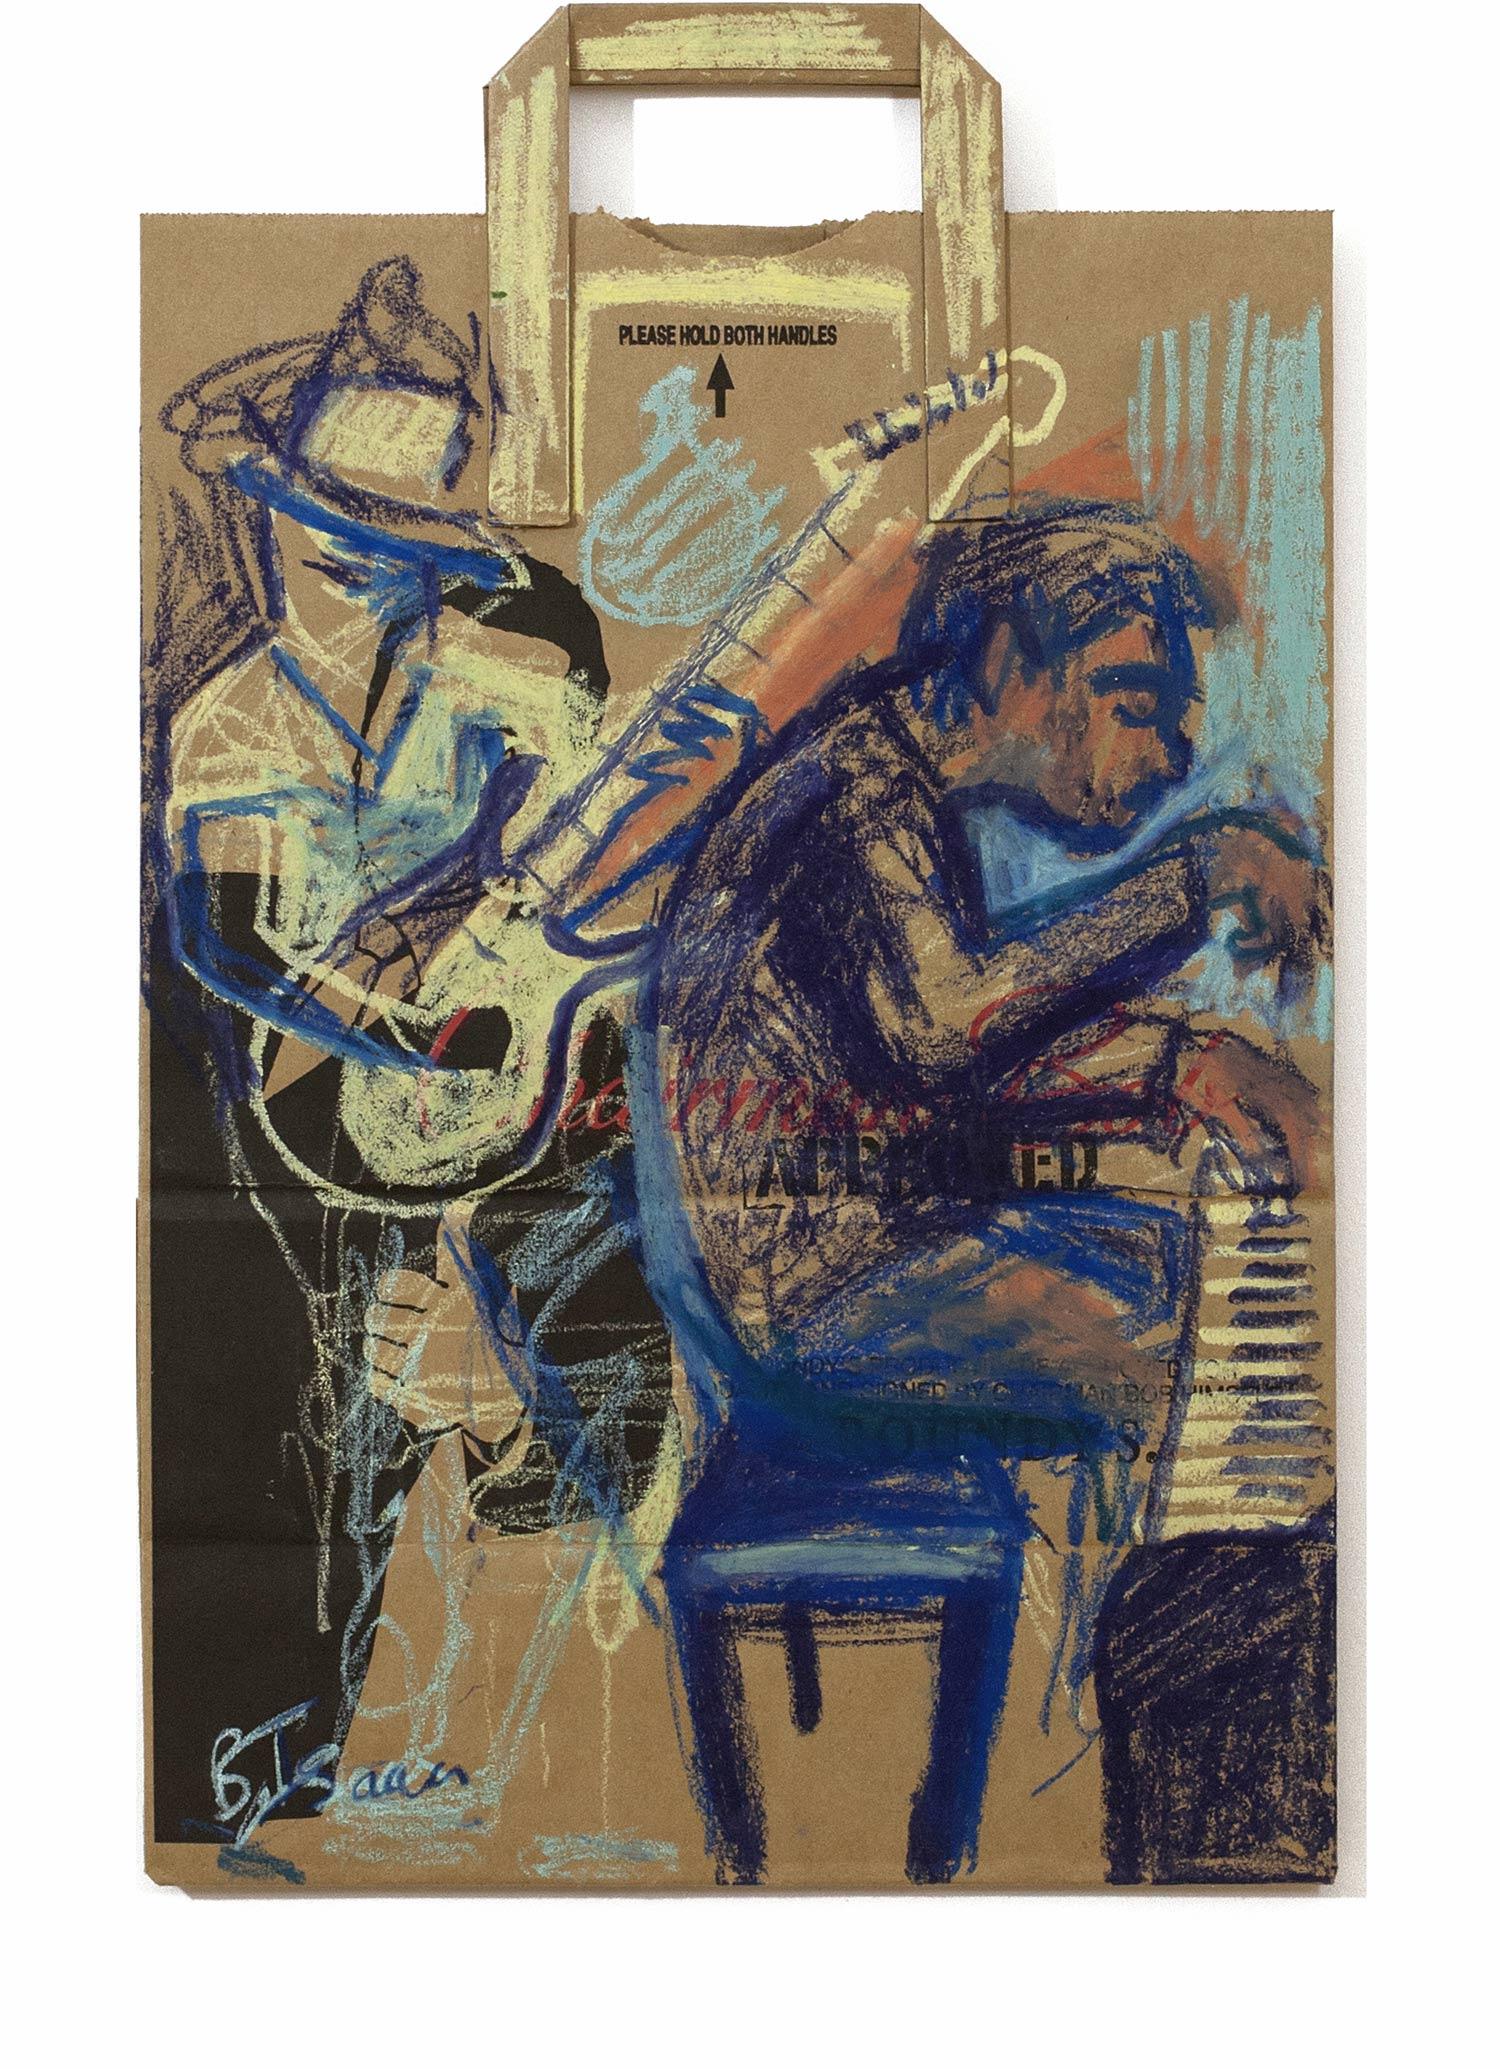 JAZZBAG JAM  Oil Pastel on paper bag | 30 x 48 cm |2015  SOLD (UK)